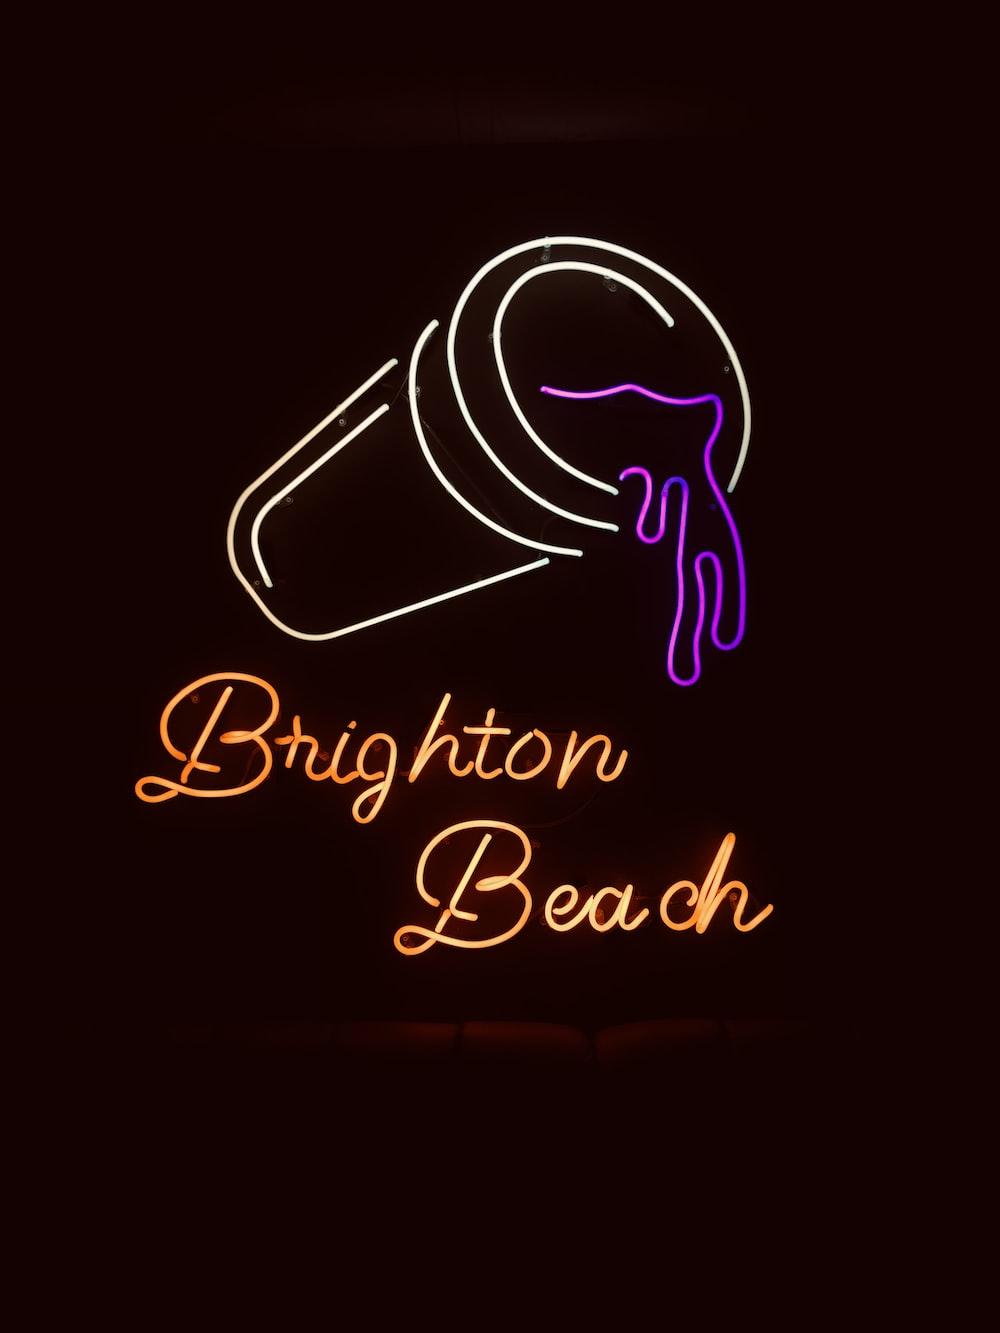 brighton beach neon signage